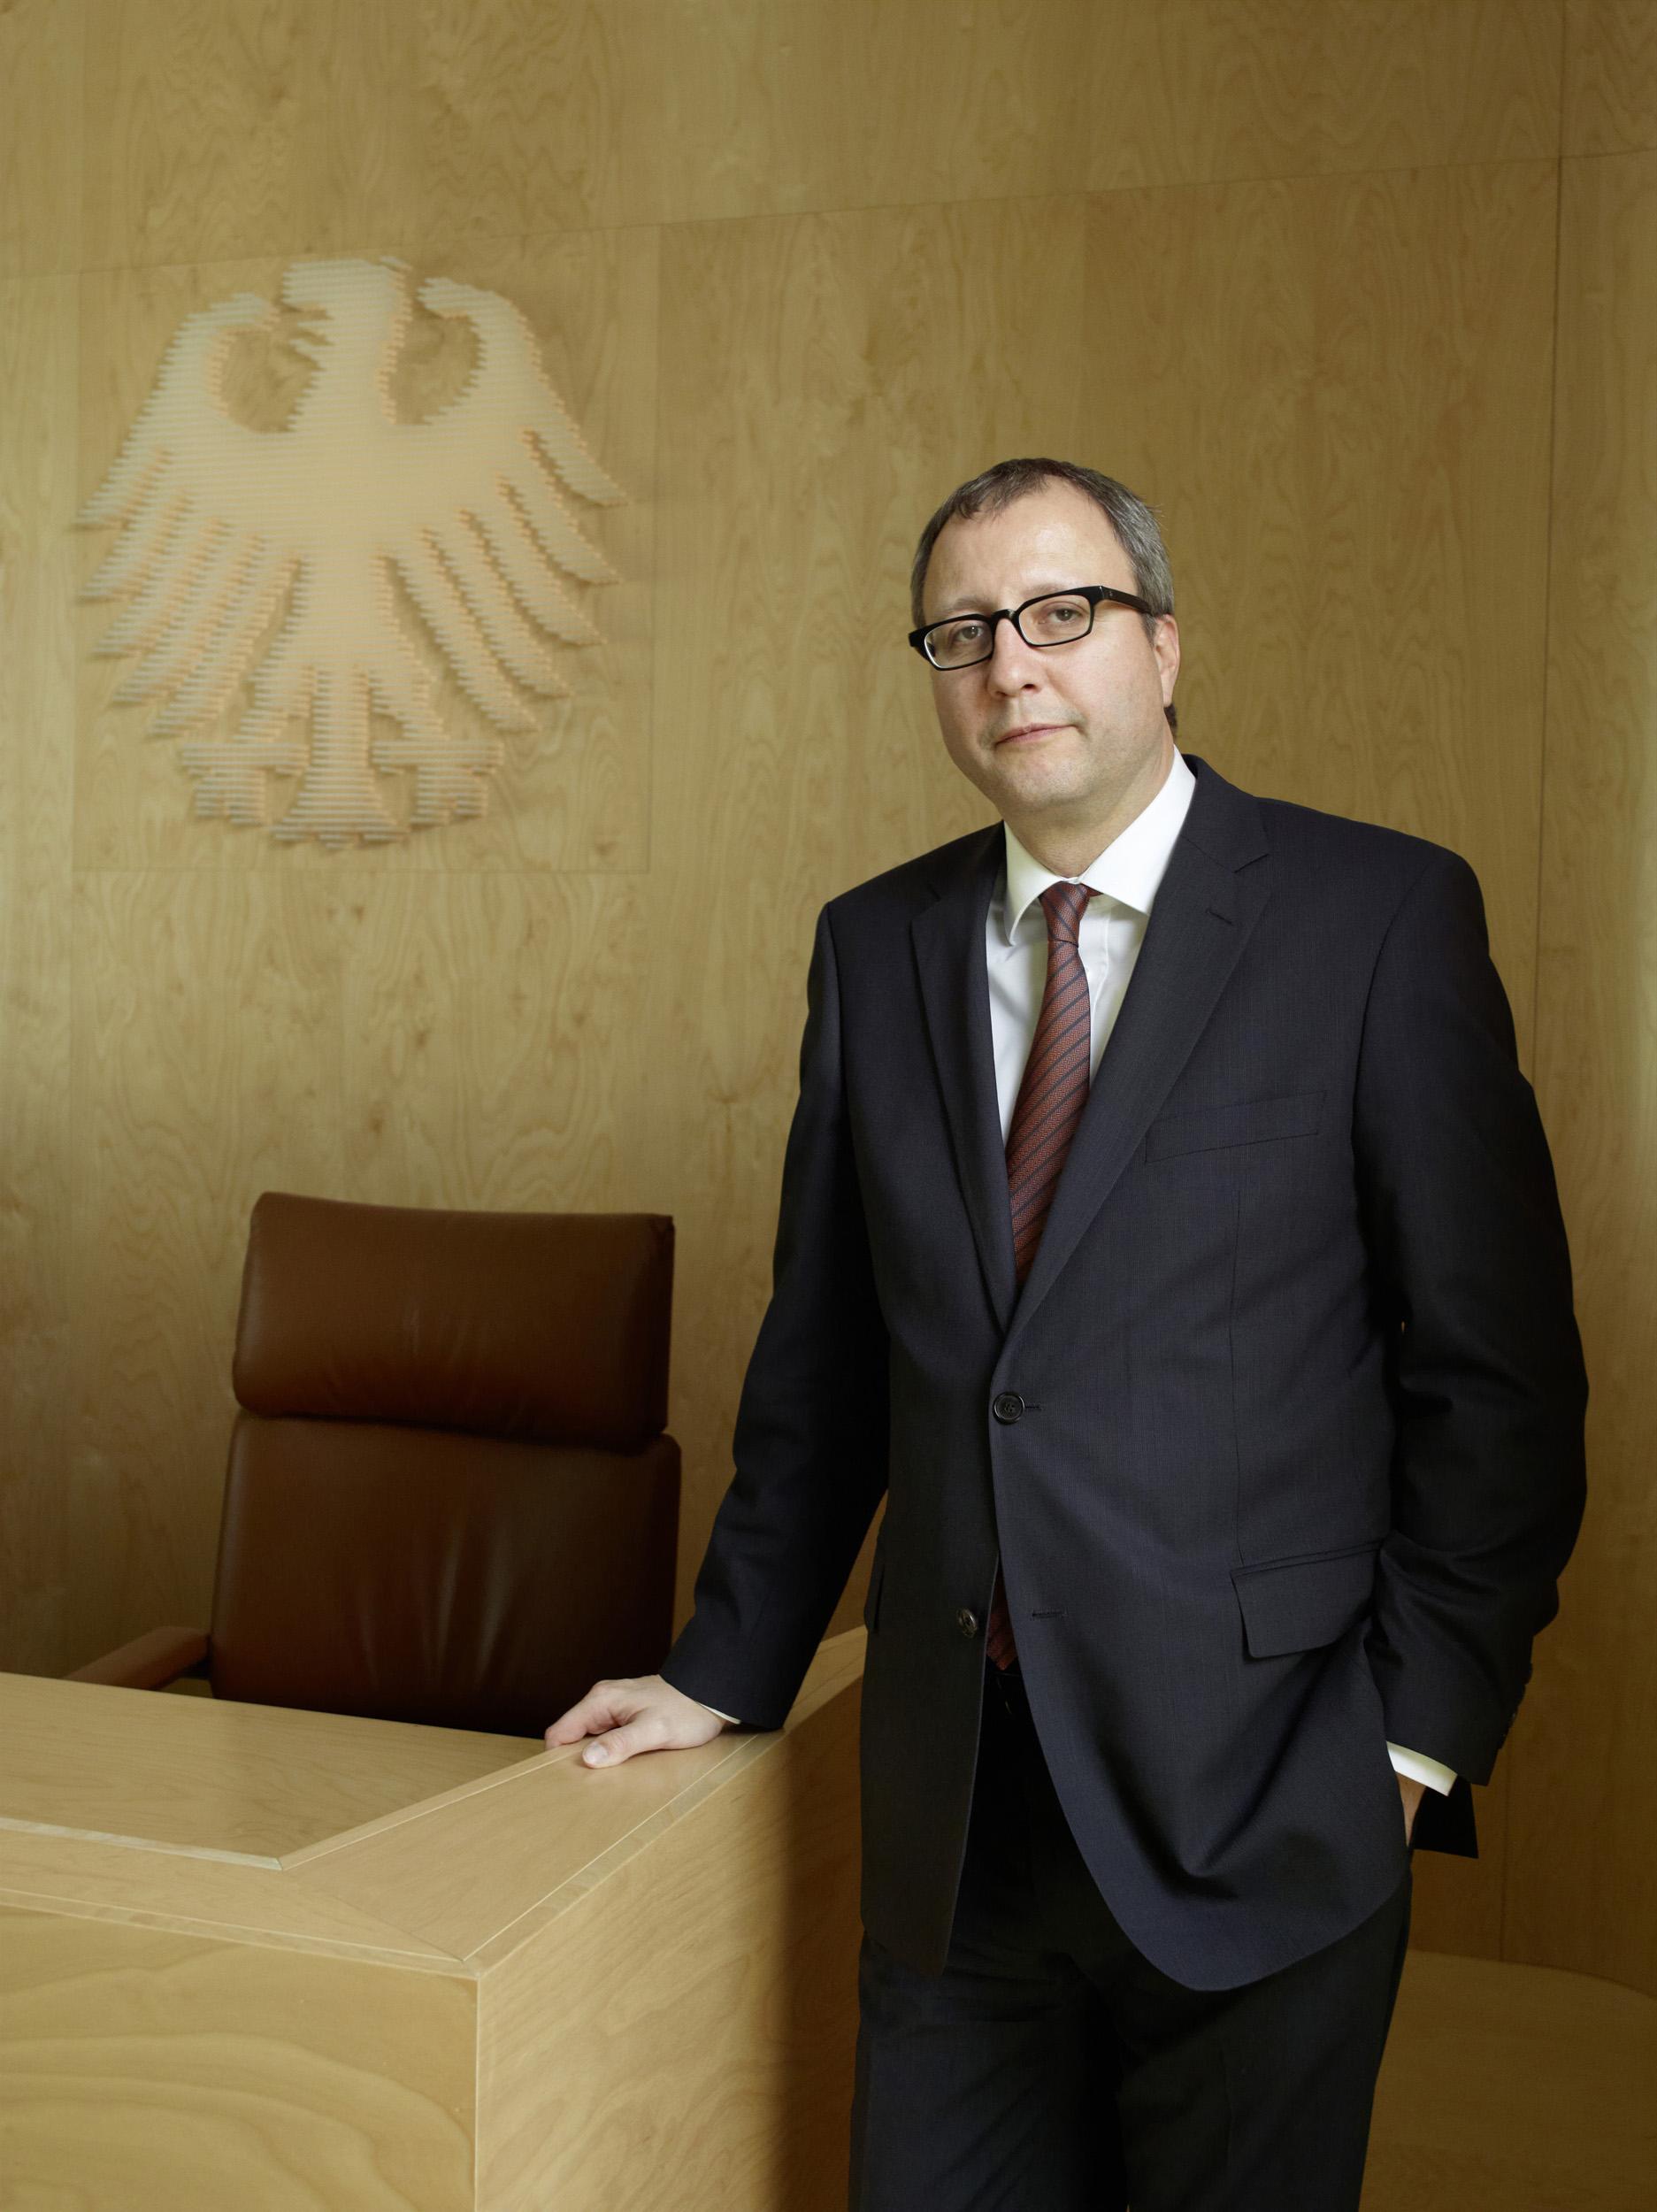 : Andreas Voßkuhle - Präsident des Bundesverfassungsgerichts